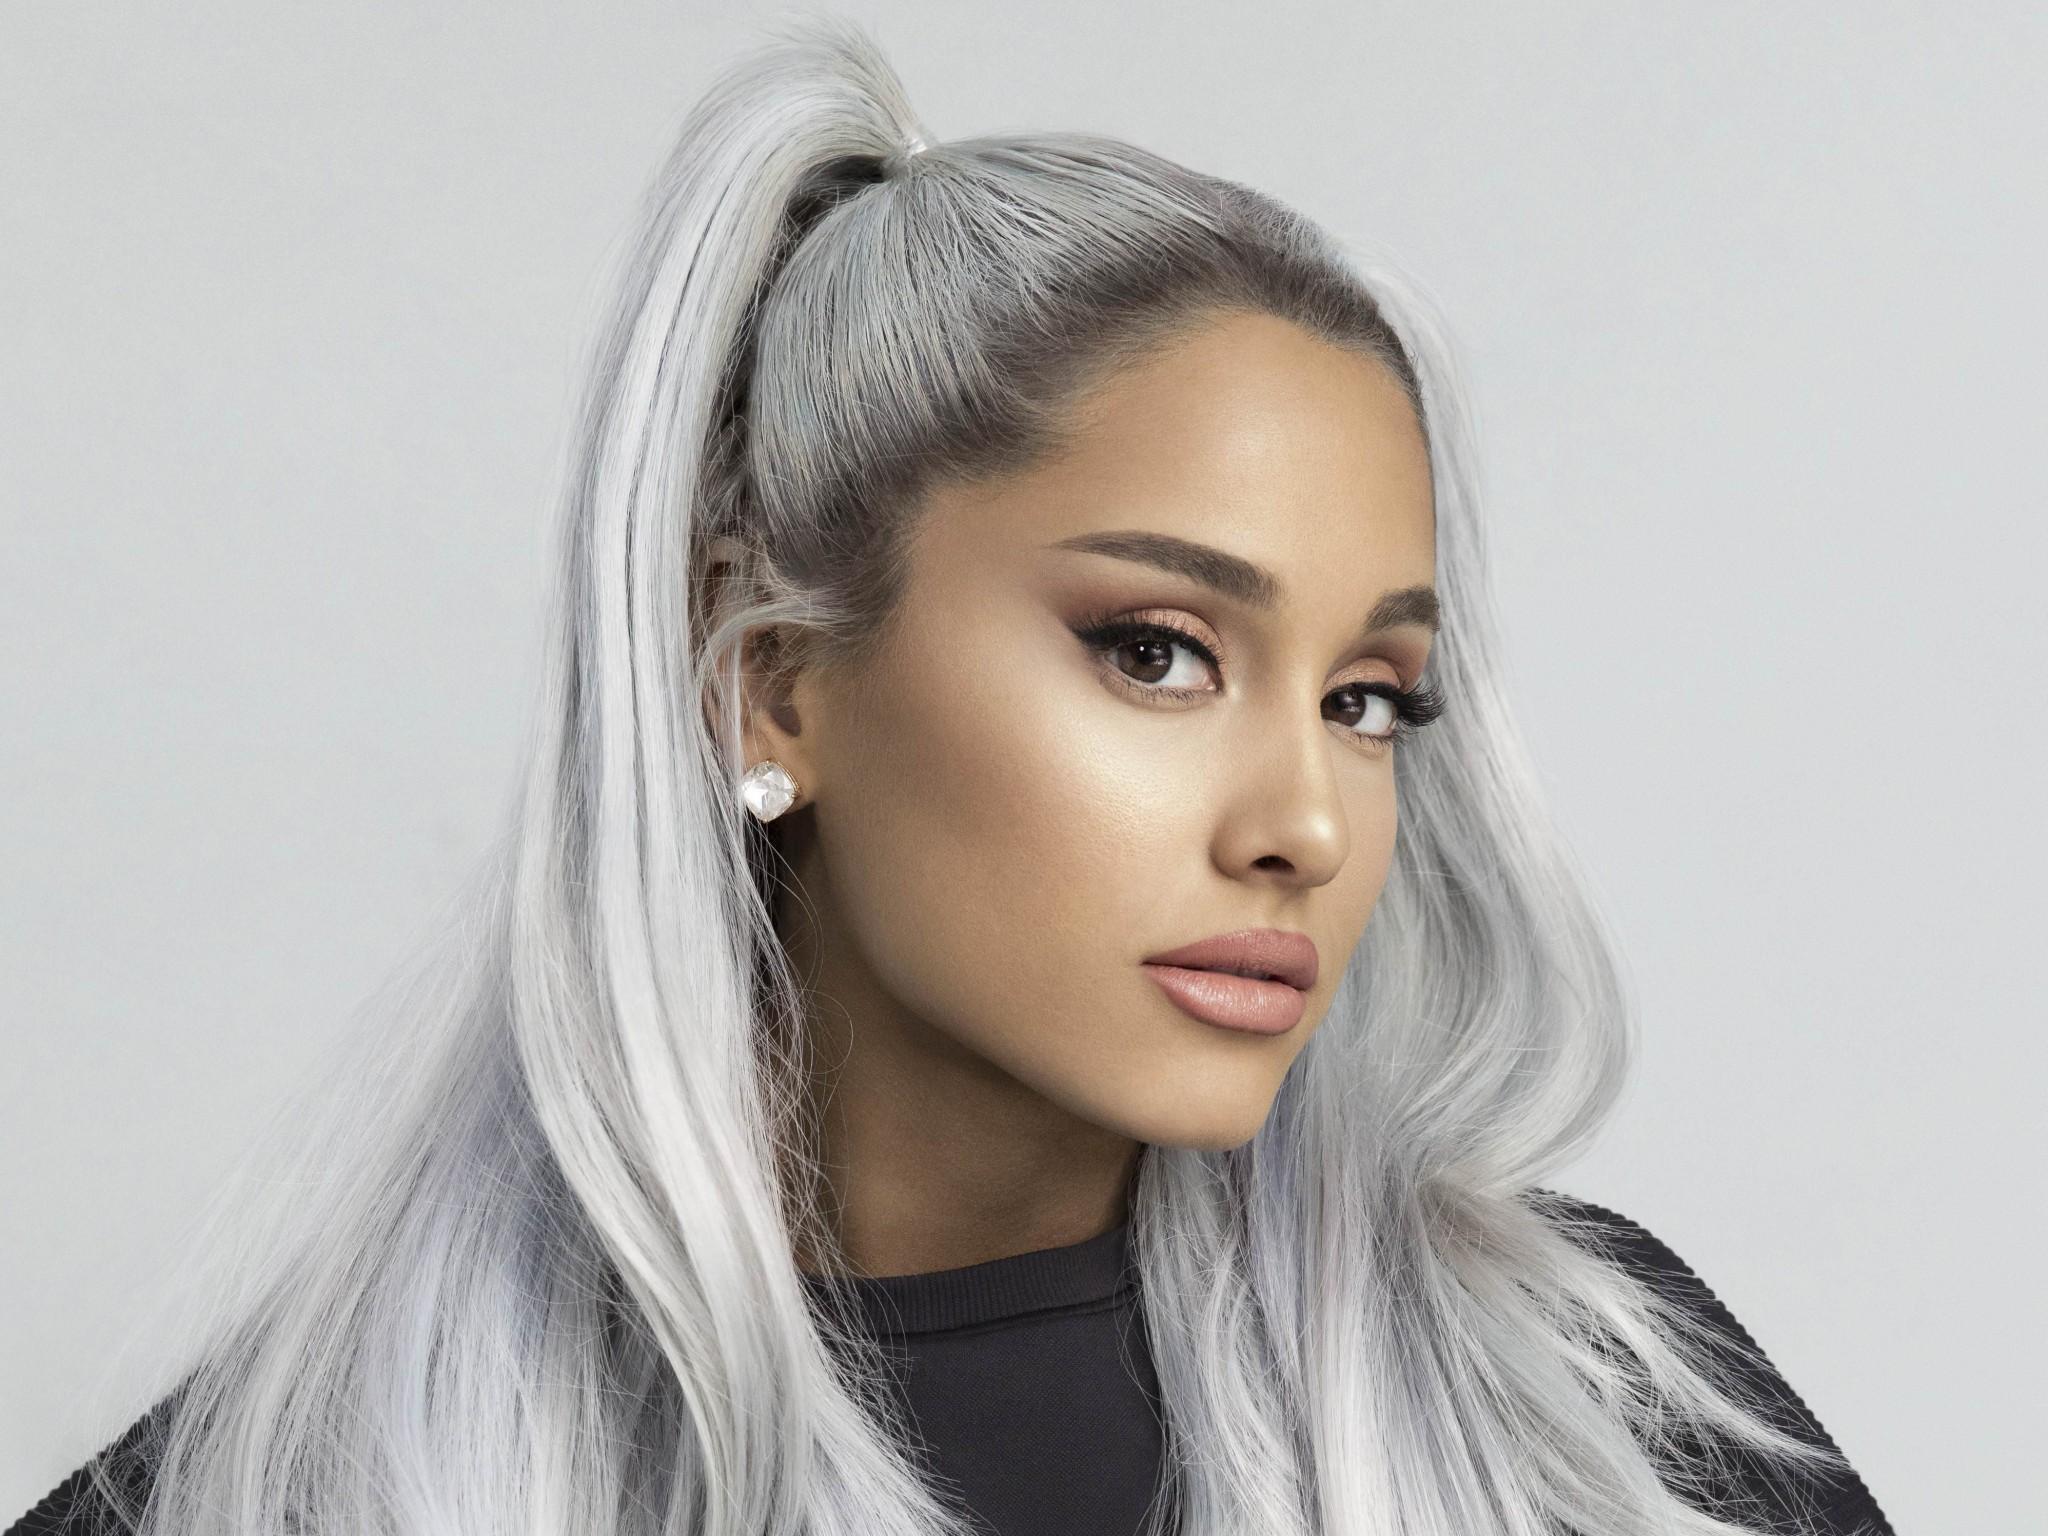 Ariana Grande 2019 Wallpapers - Wallpaper Cave